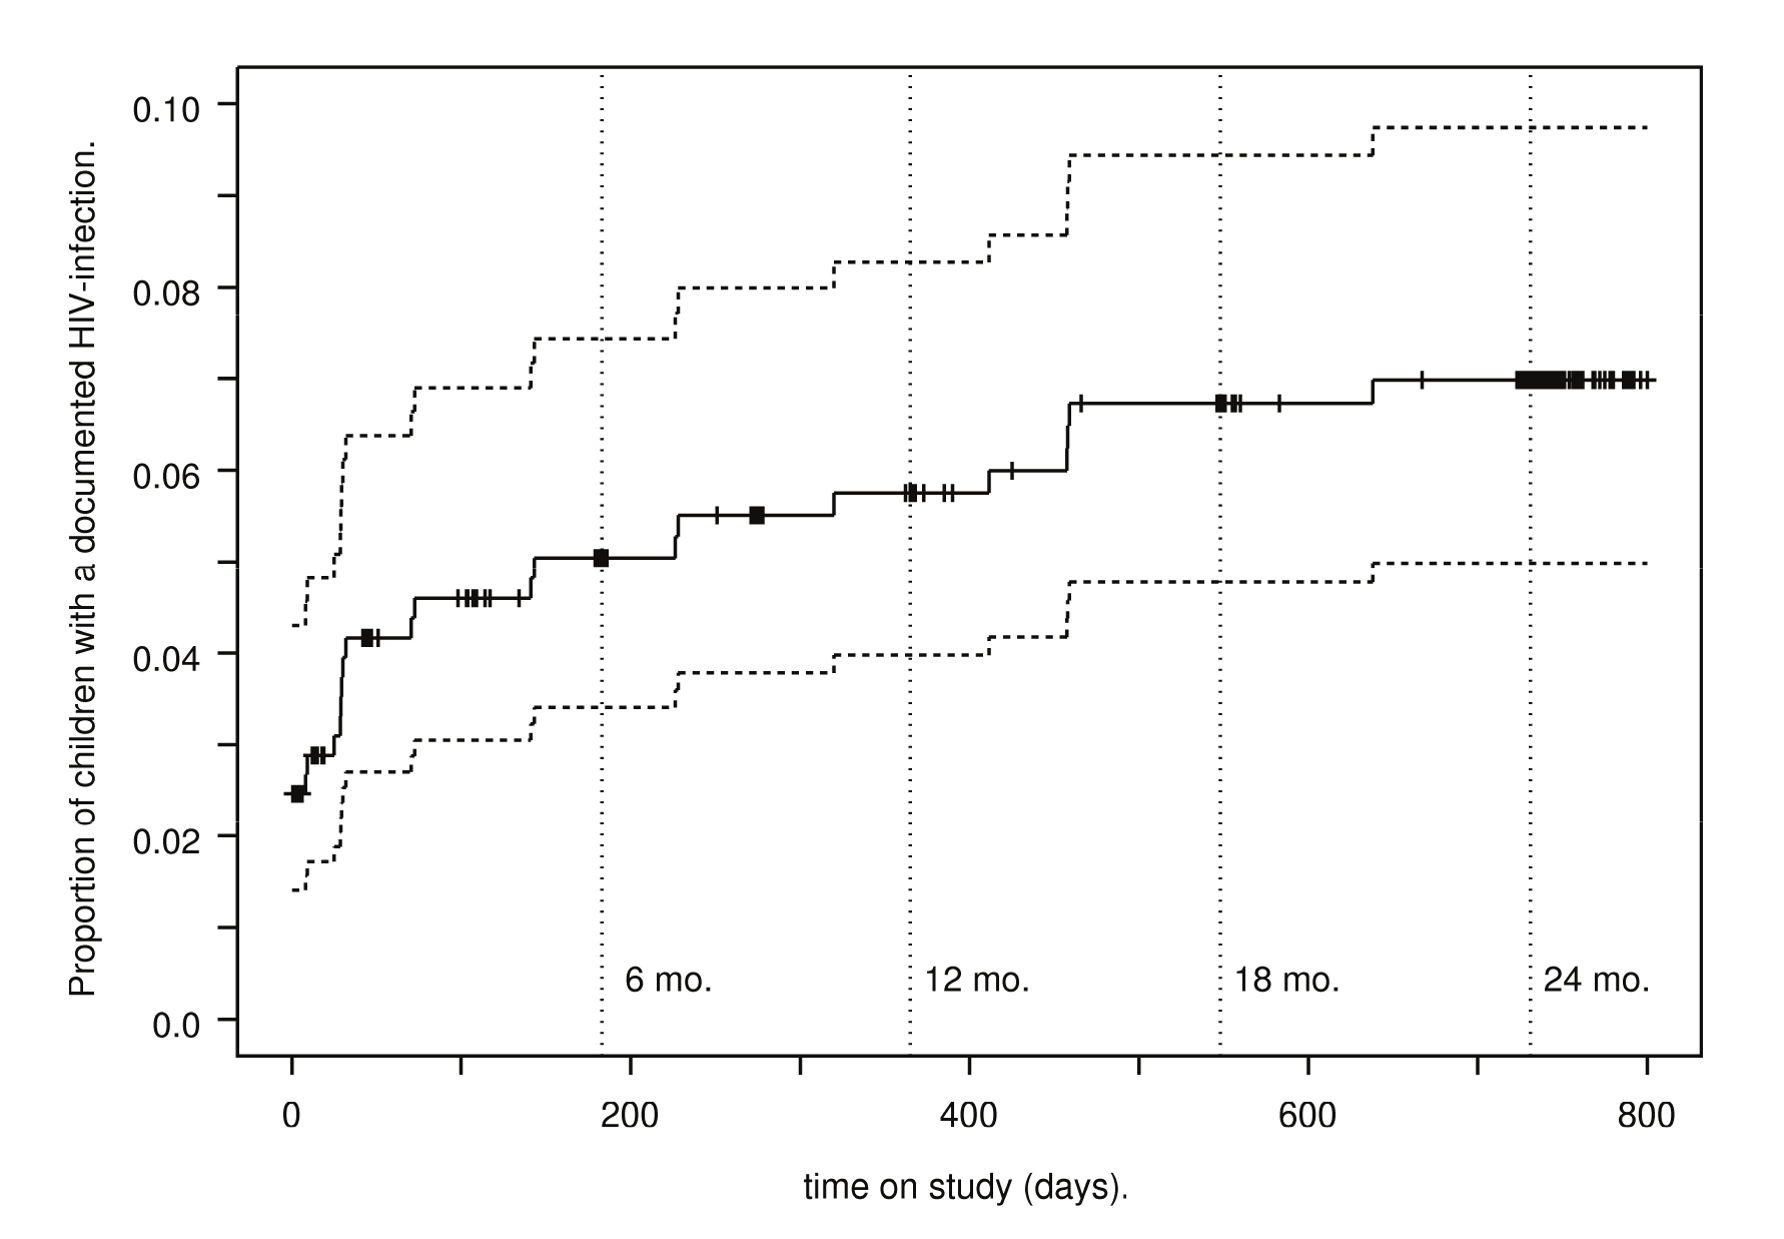 Kaplan-Meier estimates of HIV-transmission rates.